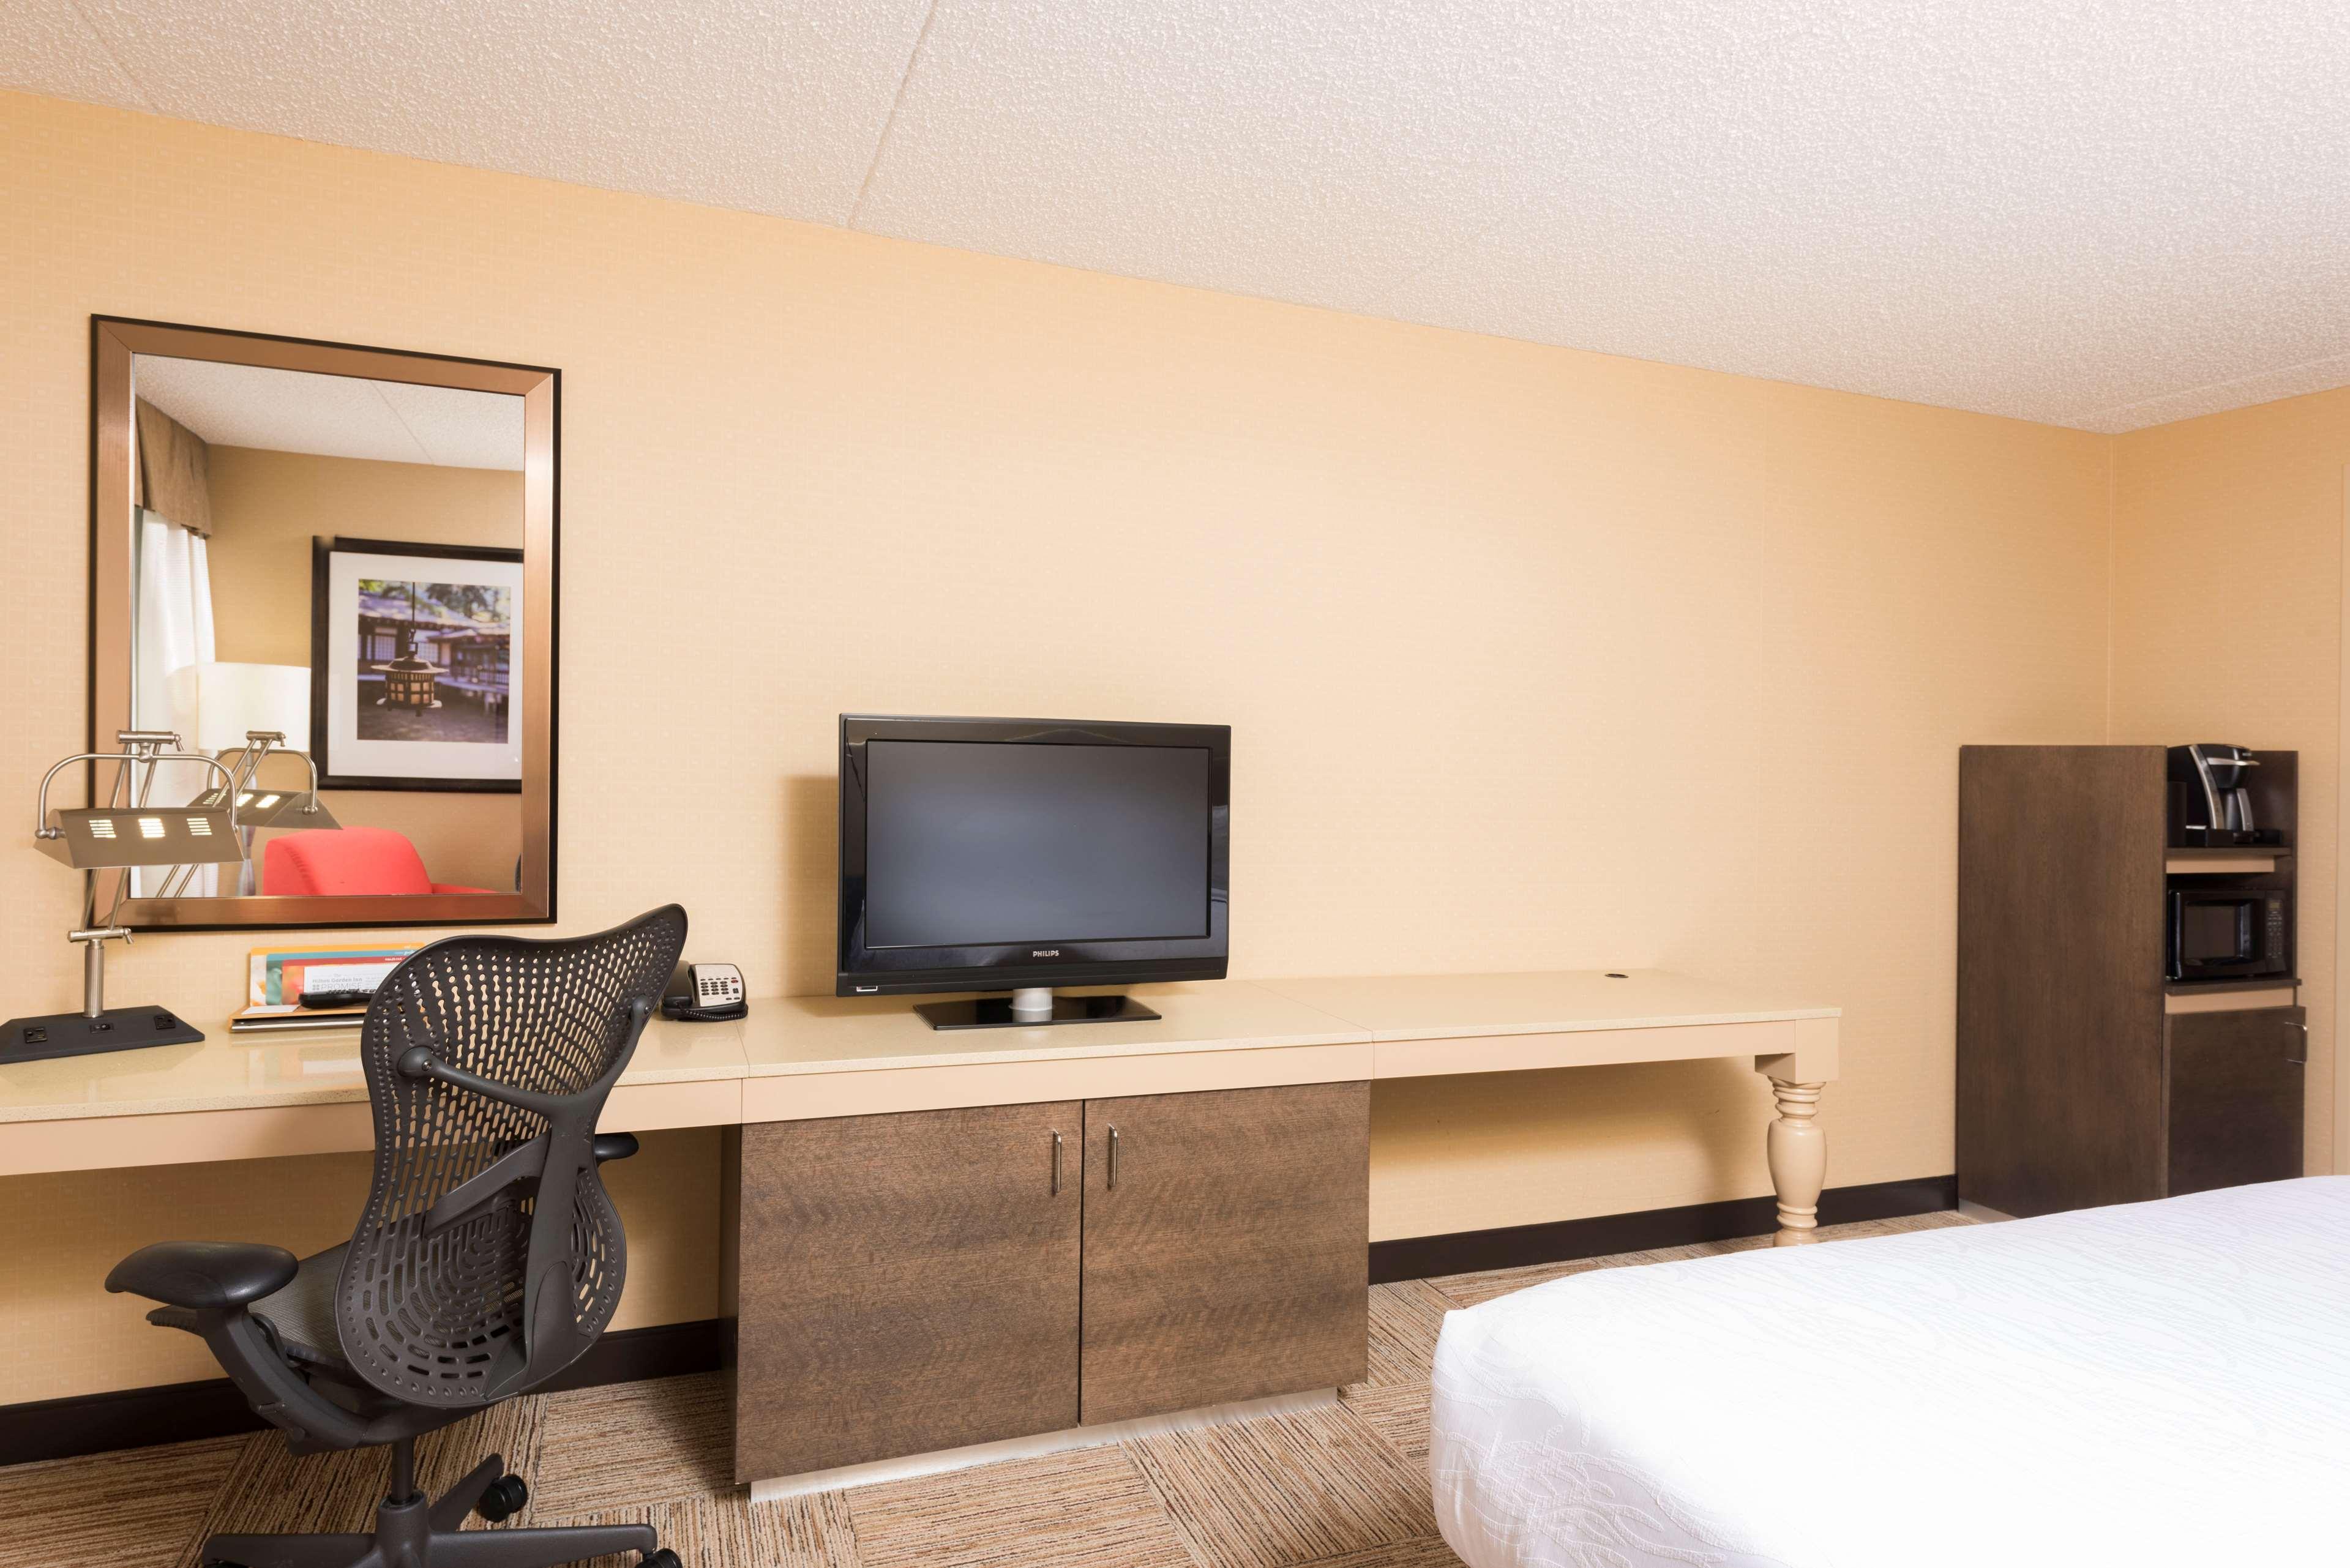 Hilton Garden Inn West Lafayette Wabash Landing image 23